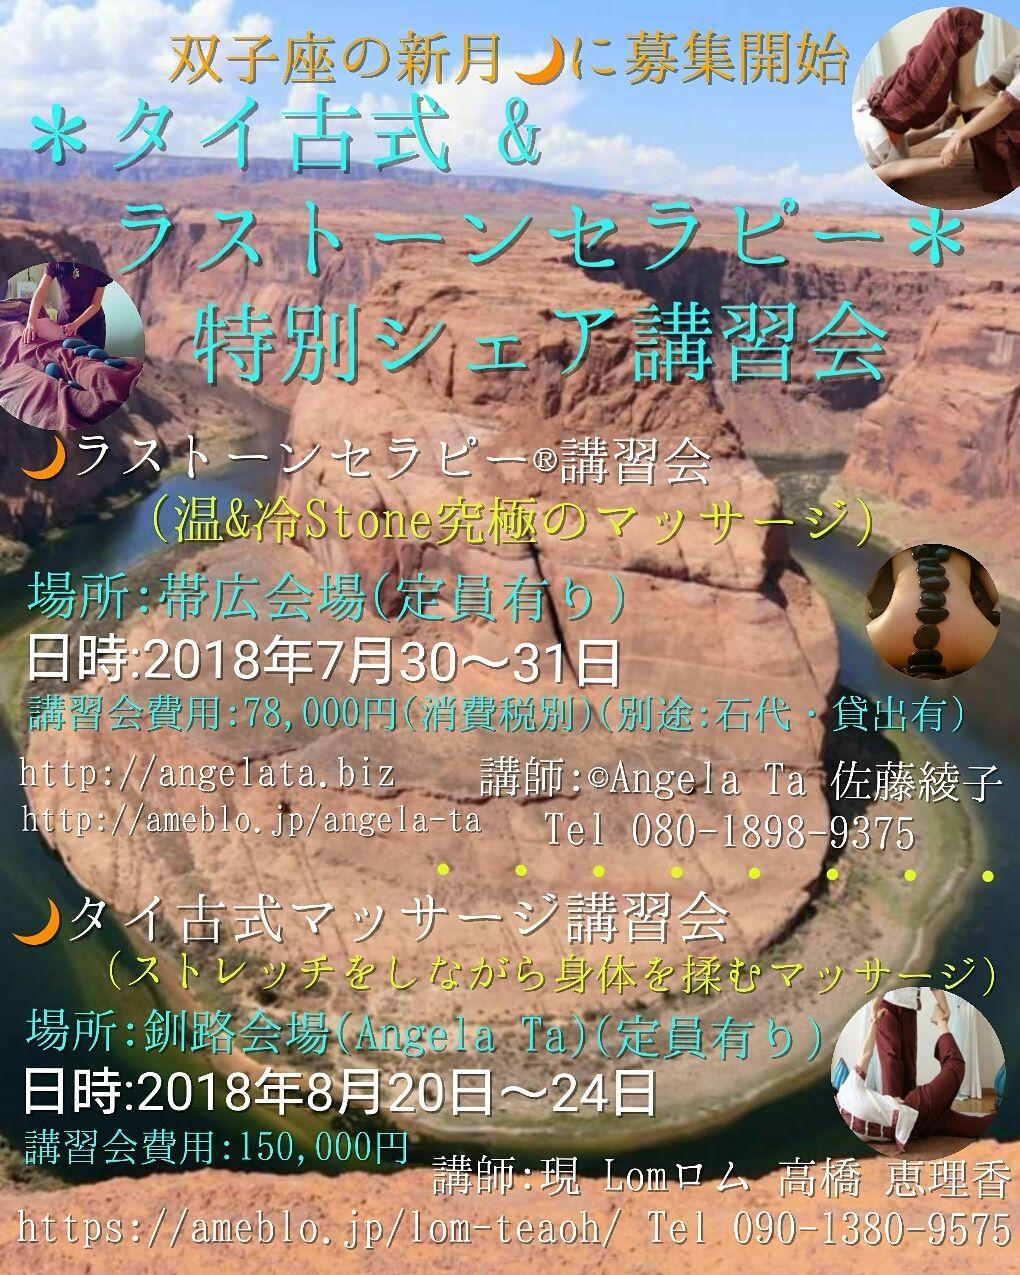 IMG_20180614_200438_587